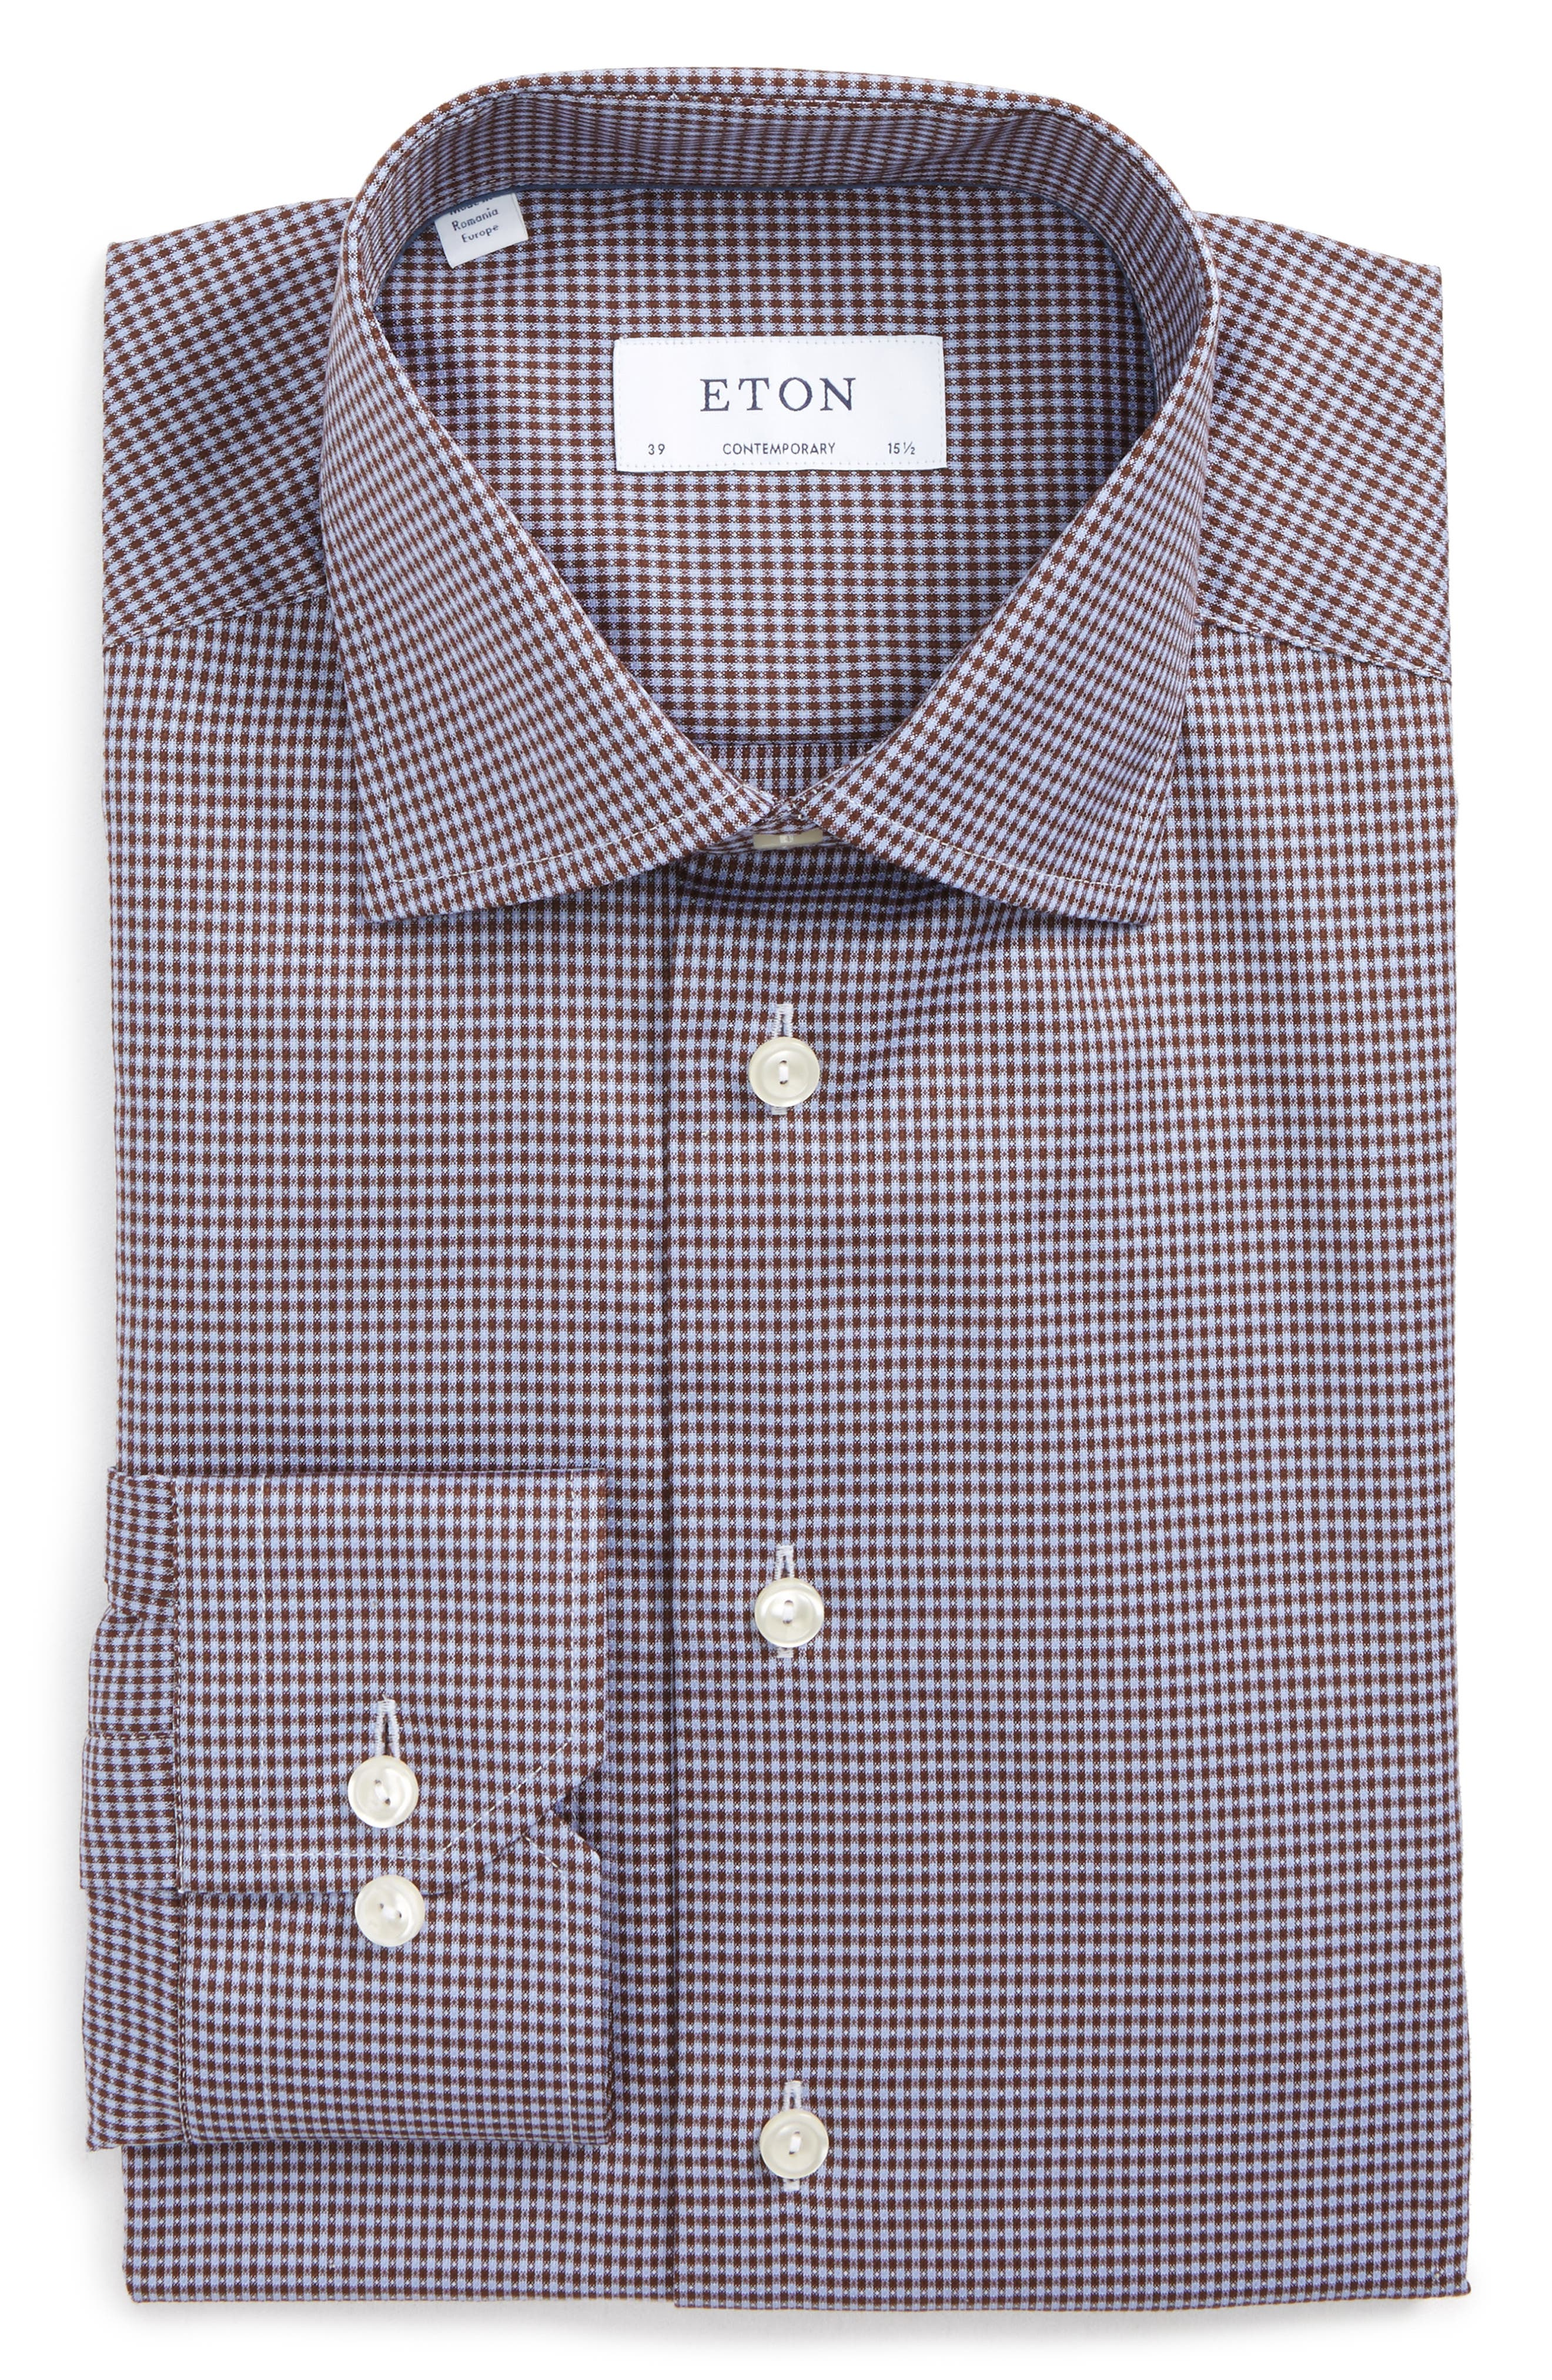 Eton Contemporary Fit Microcheck Dress Shirt